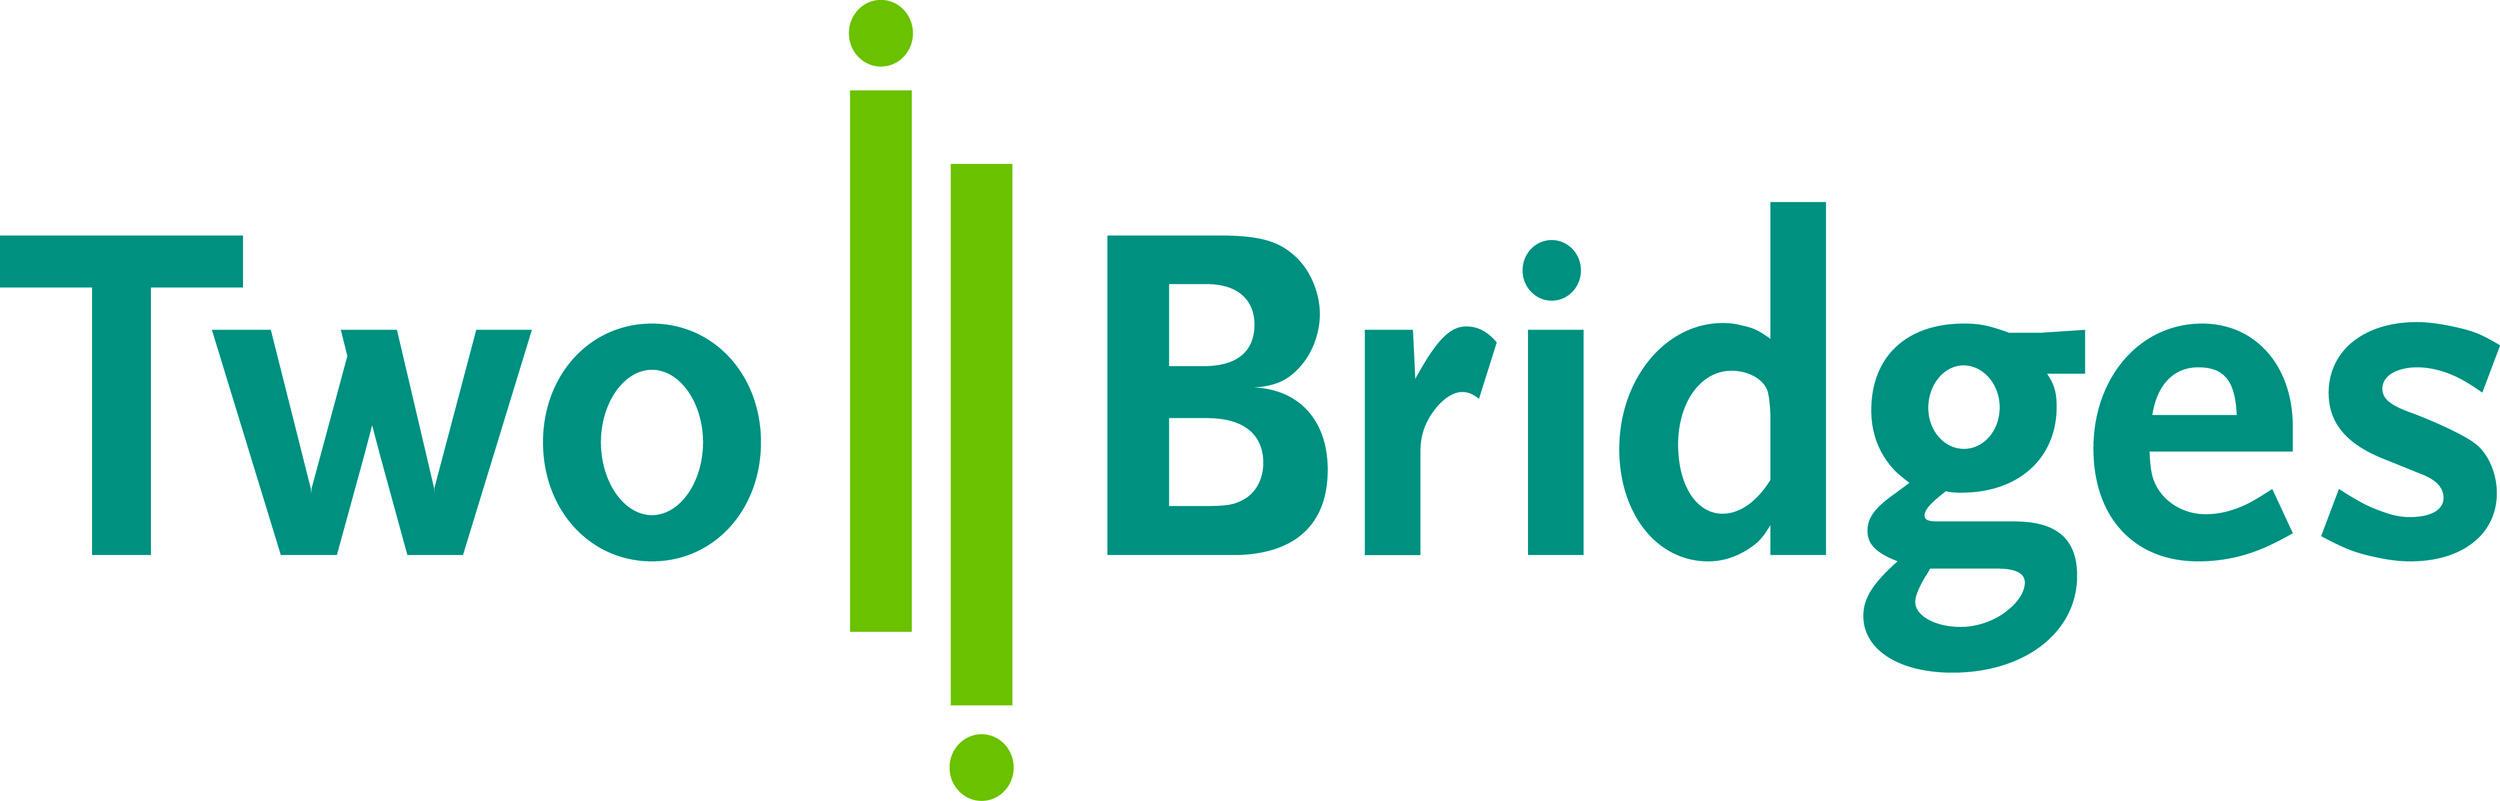 tb_logo-1.jpg